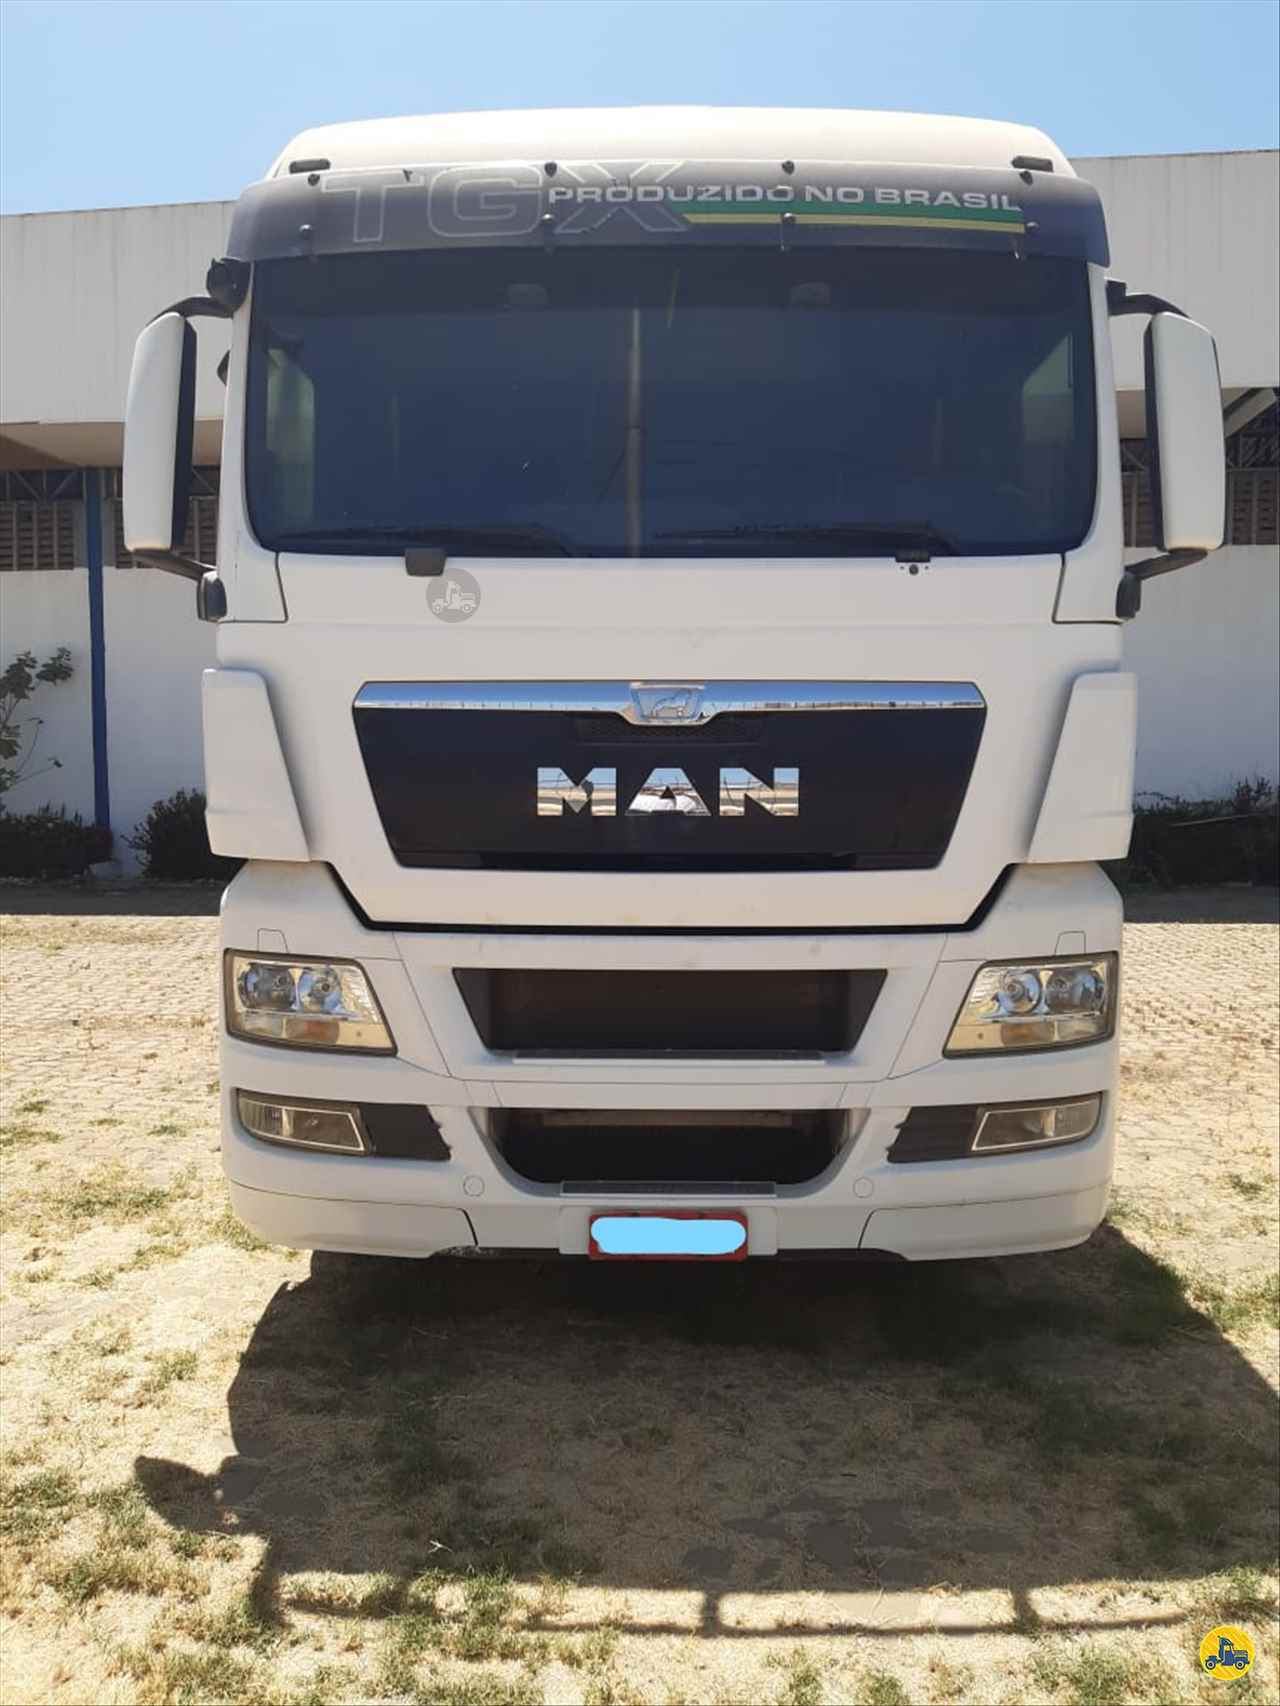 CAMINHAO MAN TGX 28 440 Cavalo Mecânico Truck 6x2 Monaco Diesel - VW ANANINDEUA PARÁ PA